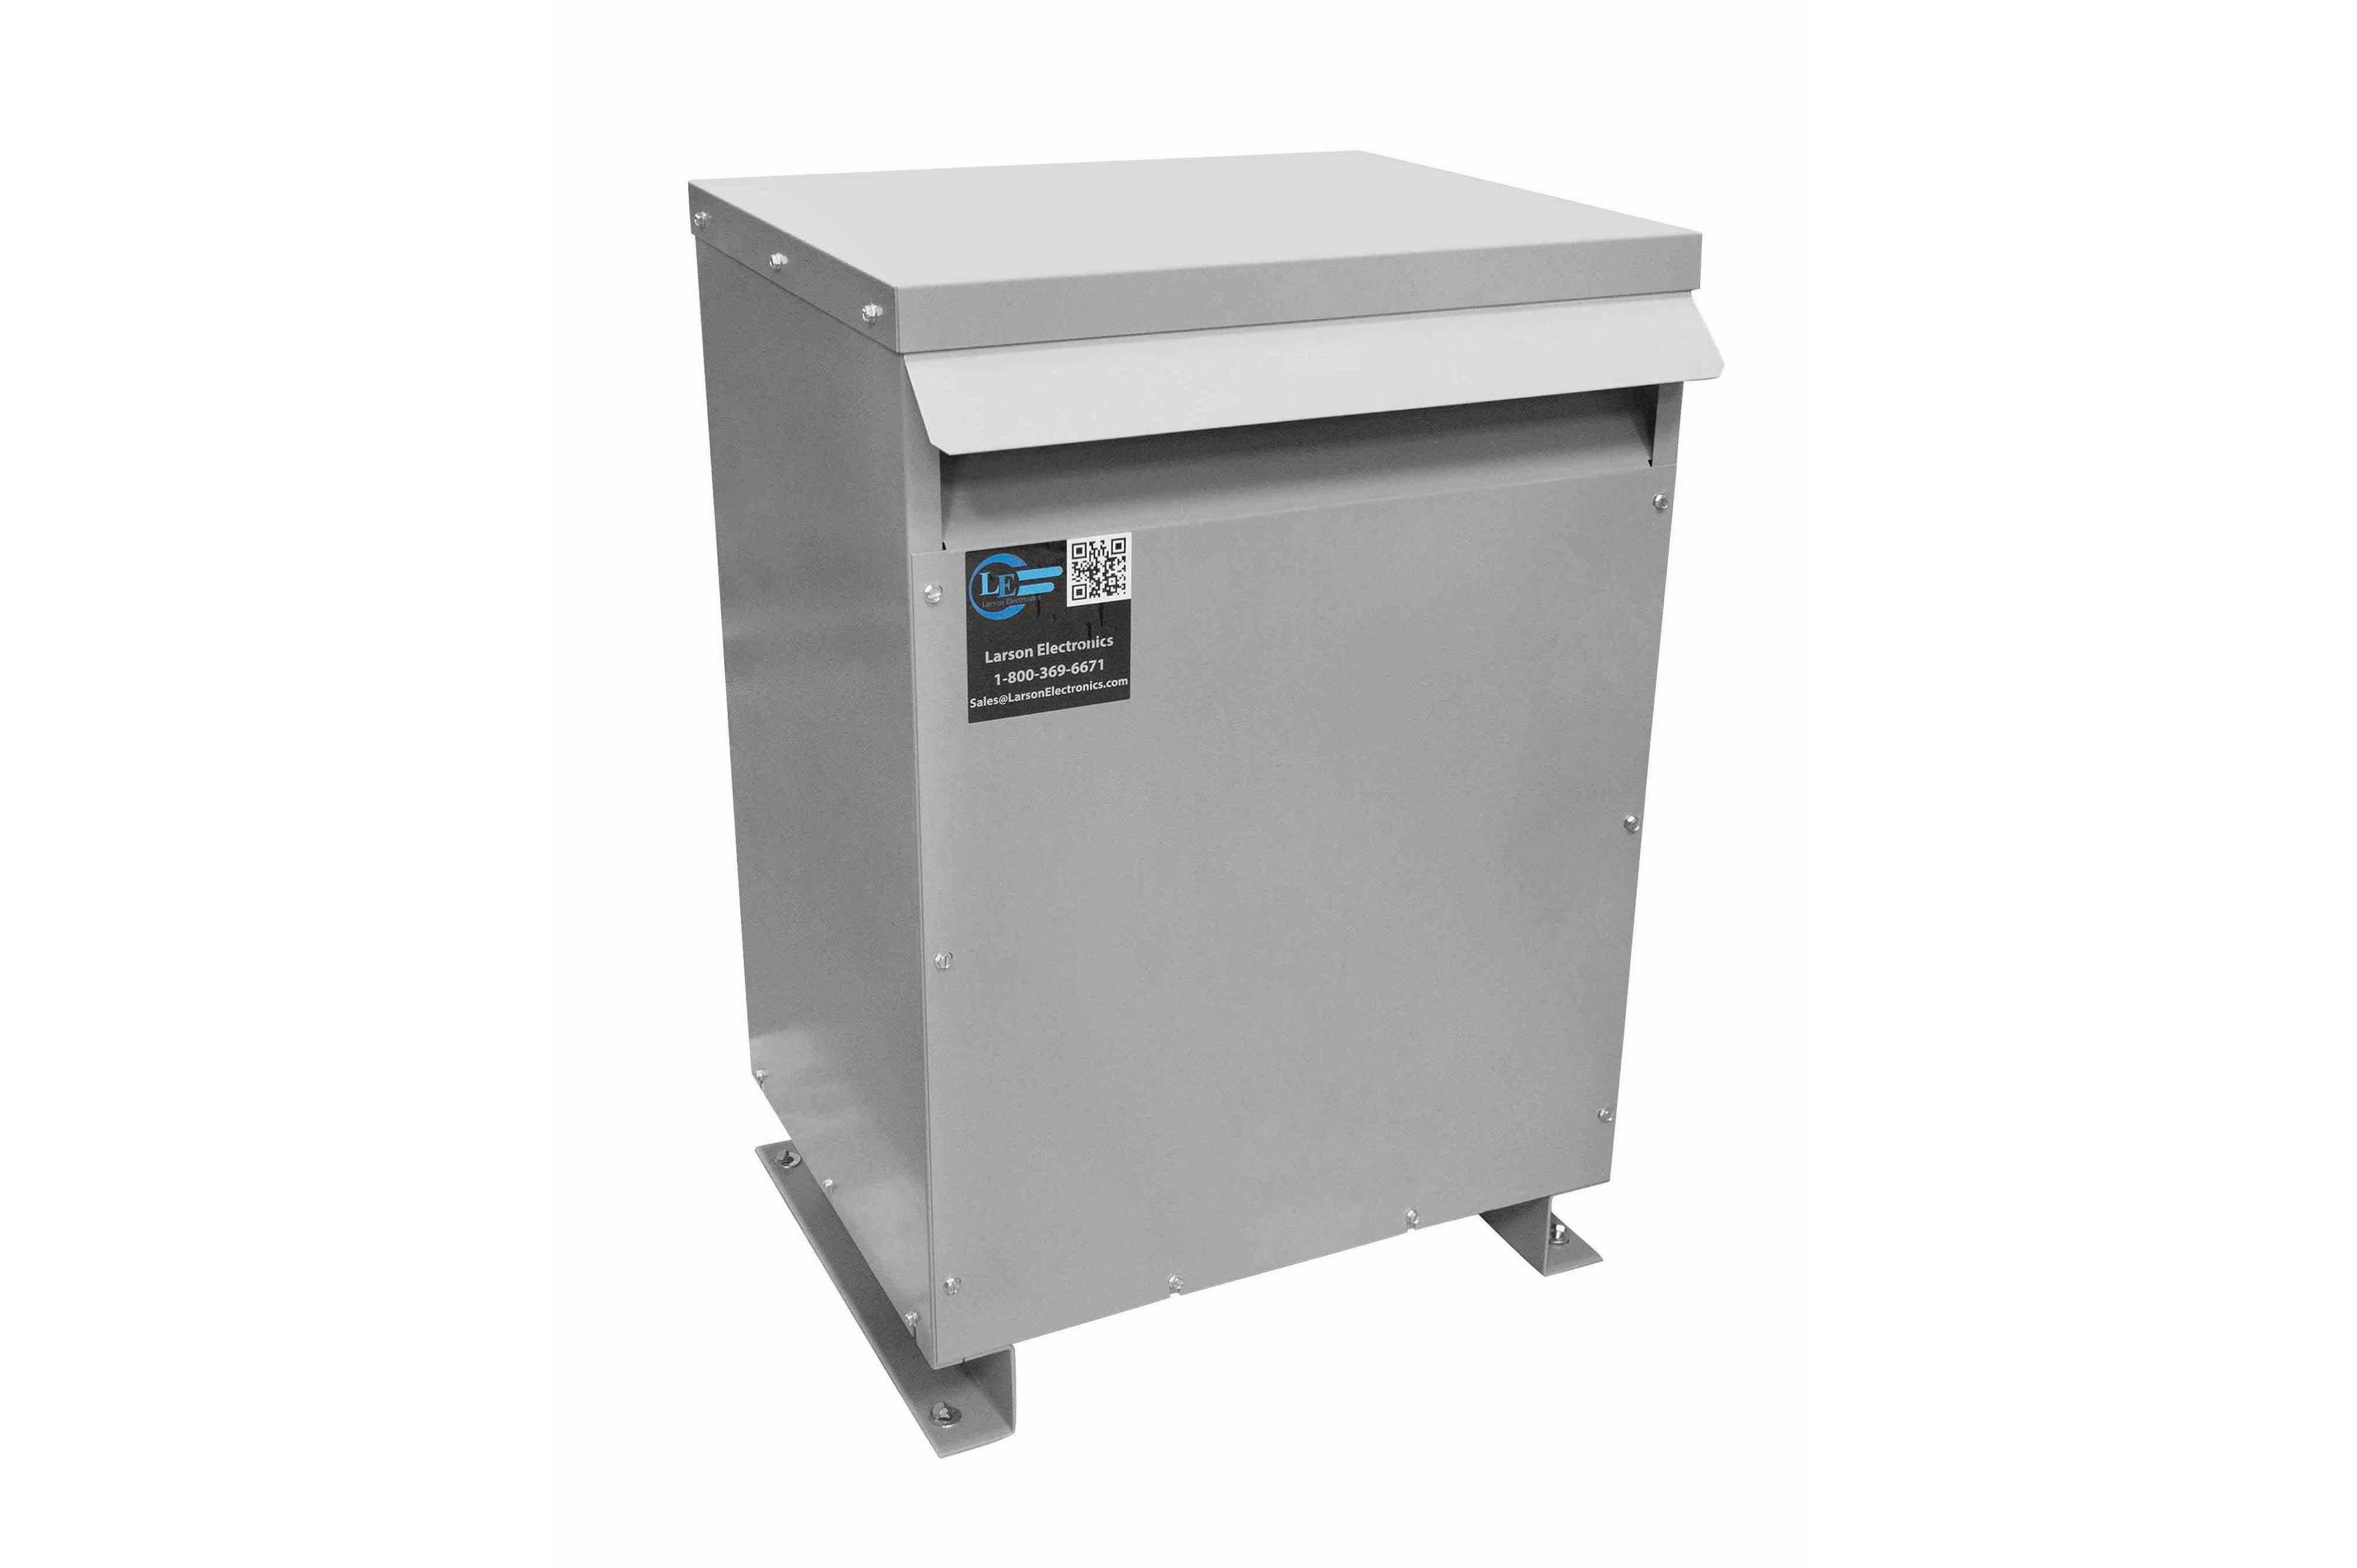 100 kVA 3PH DOE Transformer, 400V Delta Primary, 600Y/347 Wye-N Secondary, N3R, Ventilated, 60 Hz